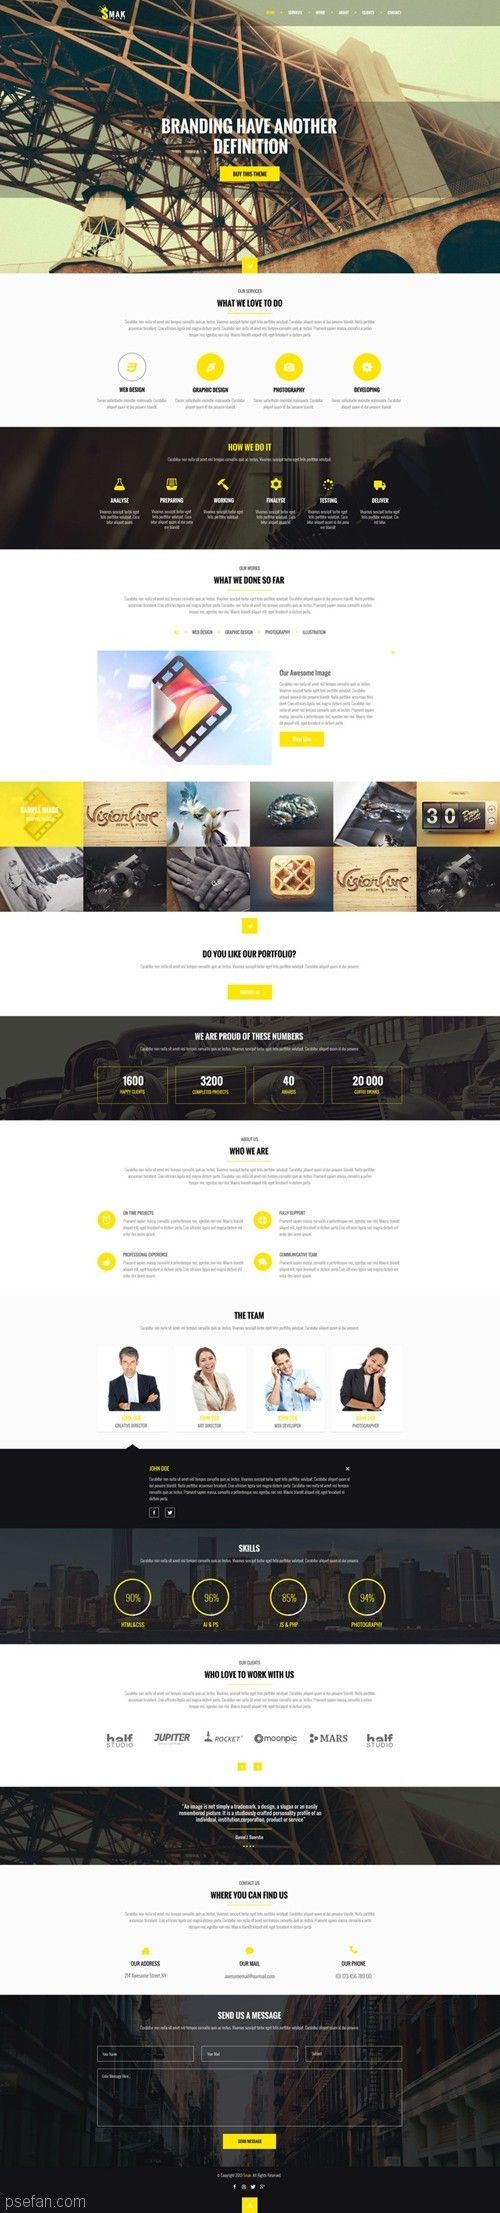 Smak 整站网页设计模板 Templa...